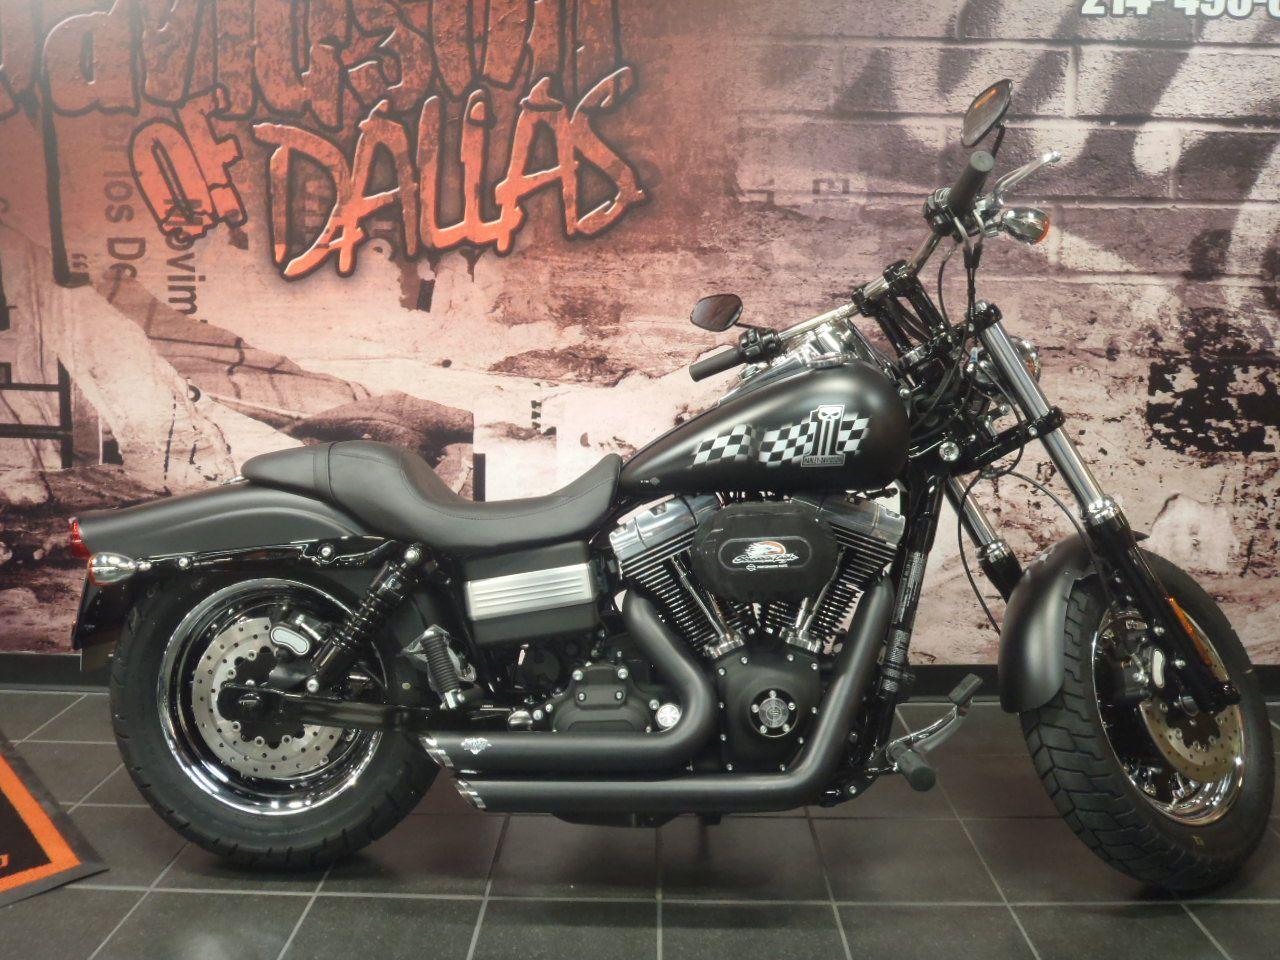 Harley-Davidson Custom Dyna Fat Bob - Race inspired FXDF! Want one just  like it? Call Chris! 214-495-0259! #Harley #HarleyDavidson #motorcycle  #race #custom ...